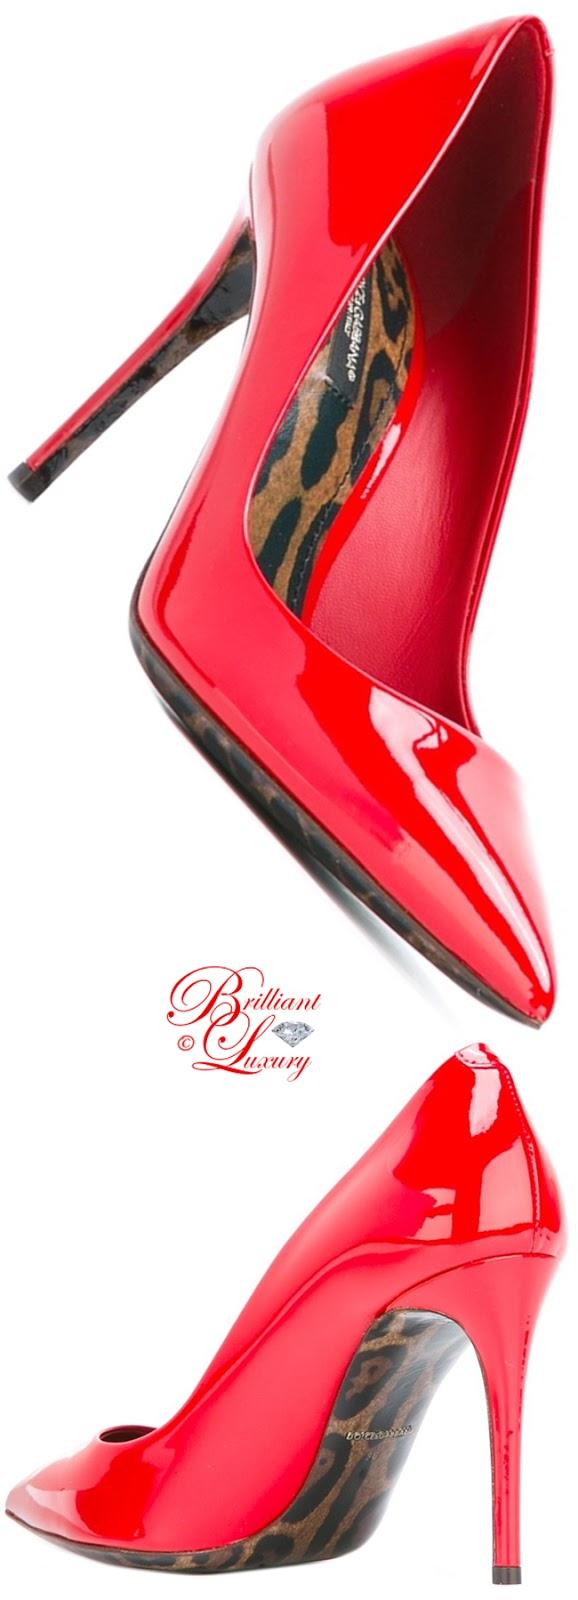 Brilliant Luxury ♦ Dolce & Gabbana Kate Pumps